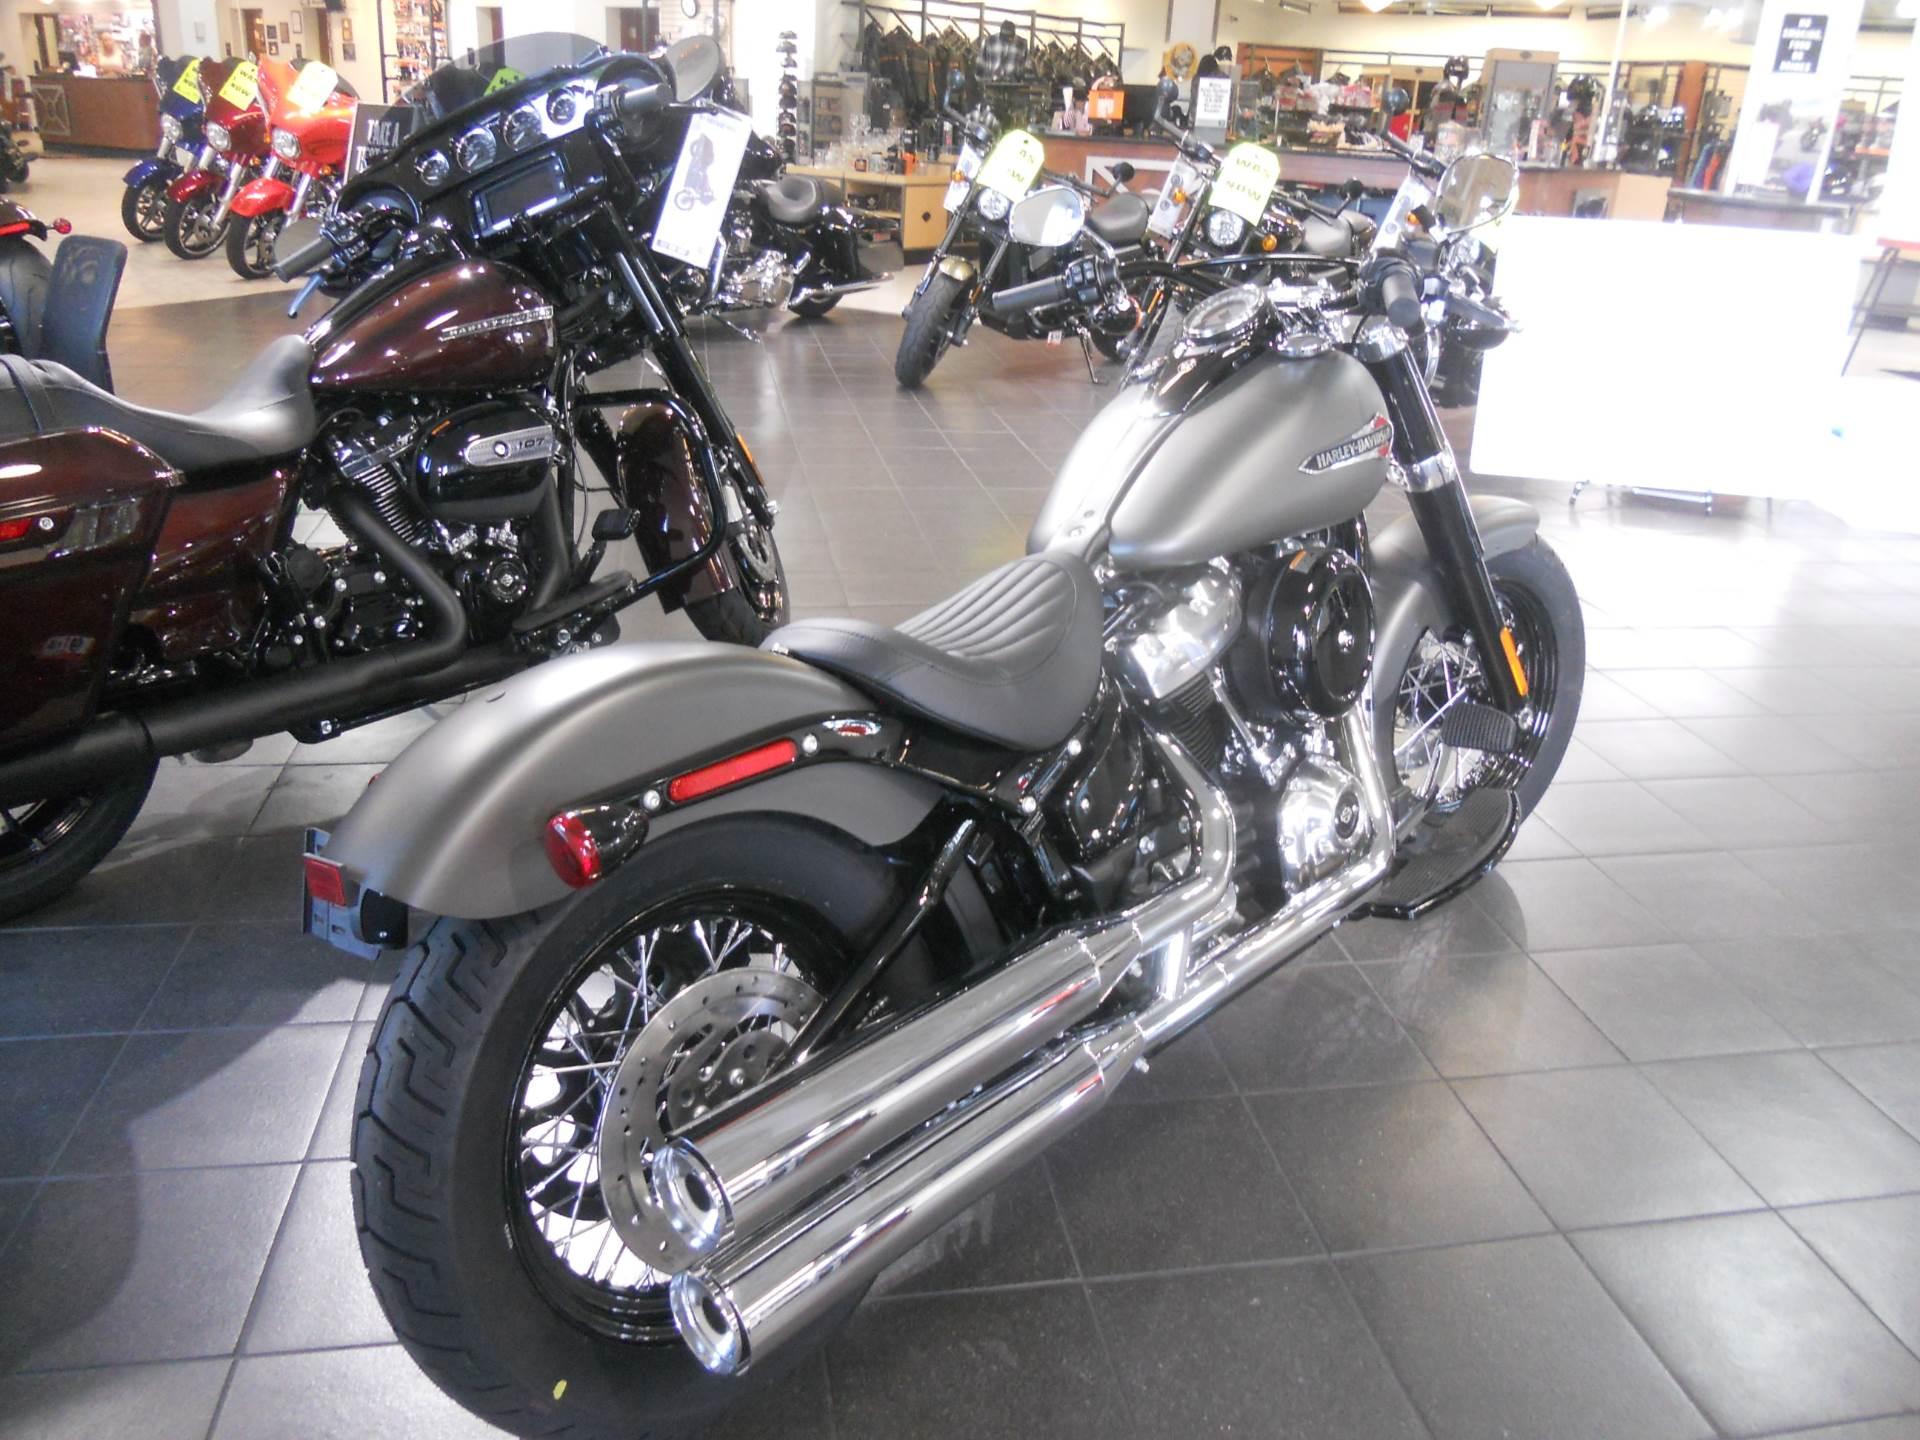 new 2018 harley davidson softail slim 107 motorcycles in manassas va stock number 023662. Black Bedroom Furniture Sets. Home Design Ideas